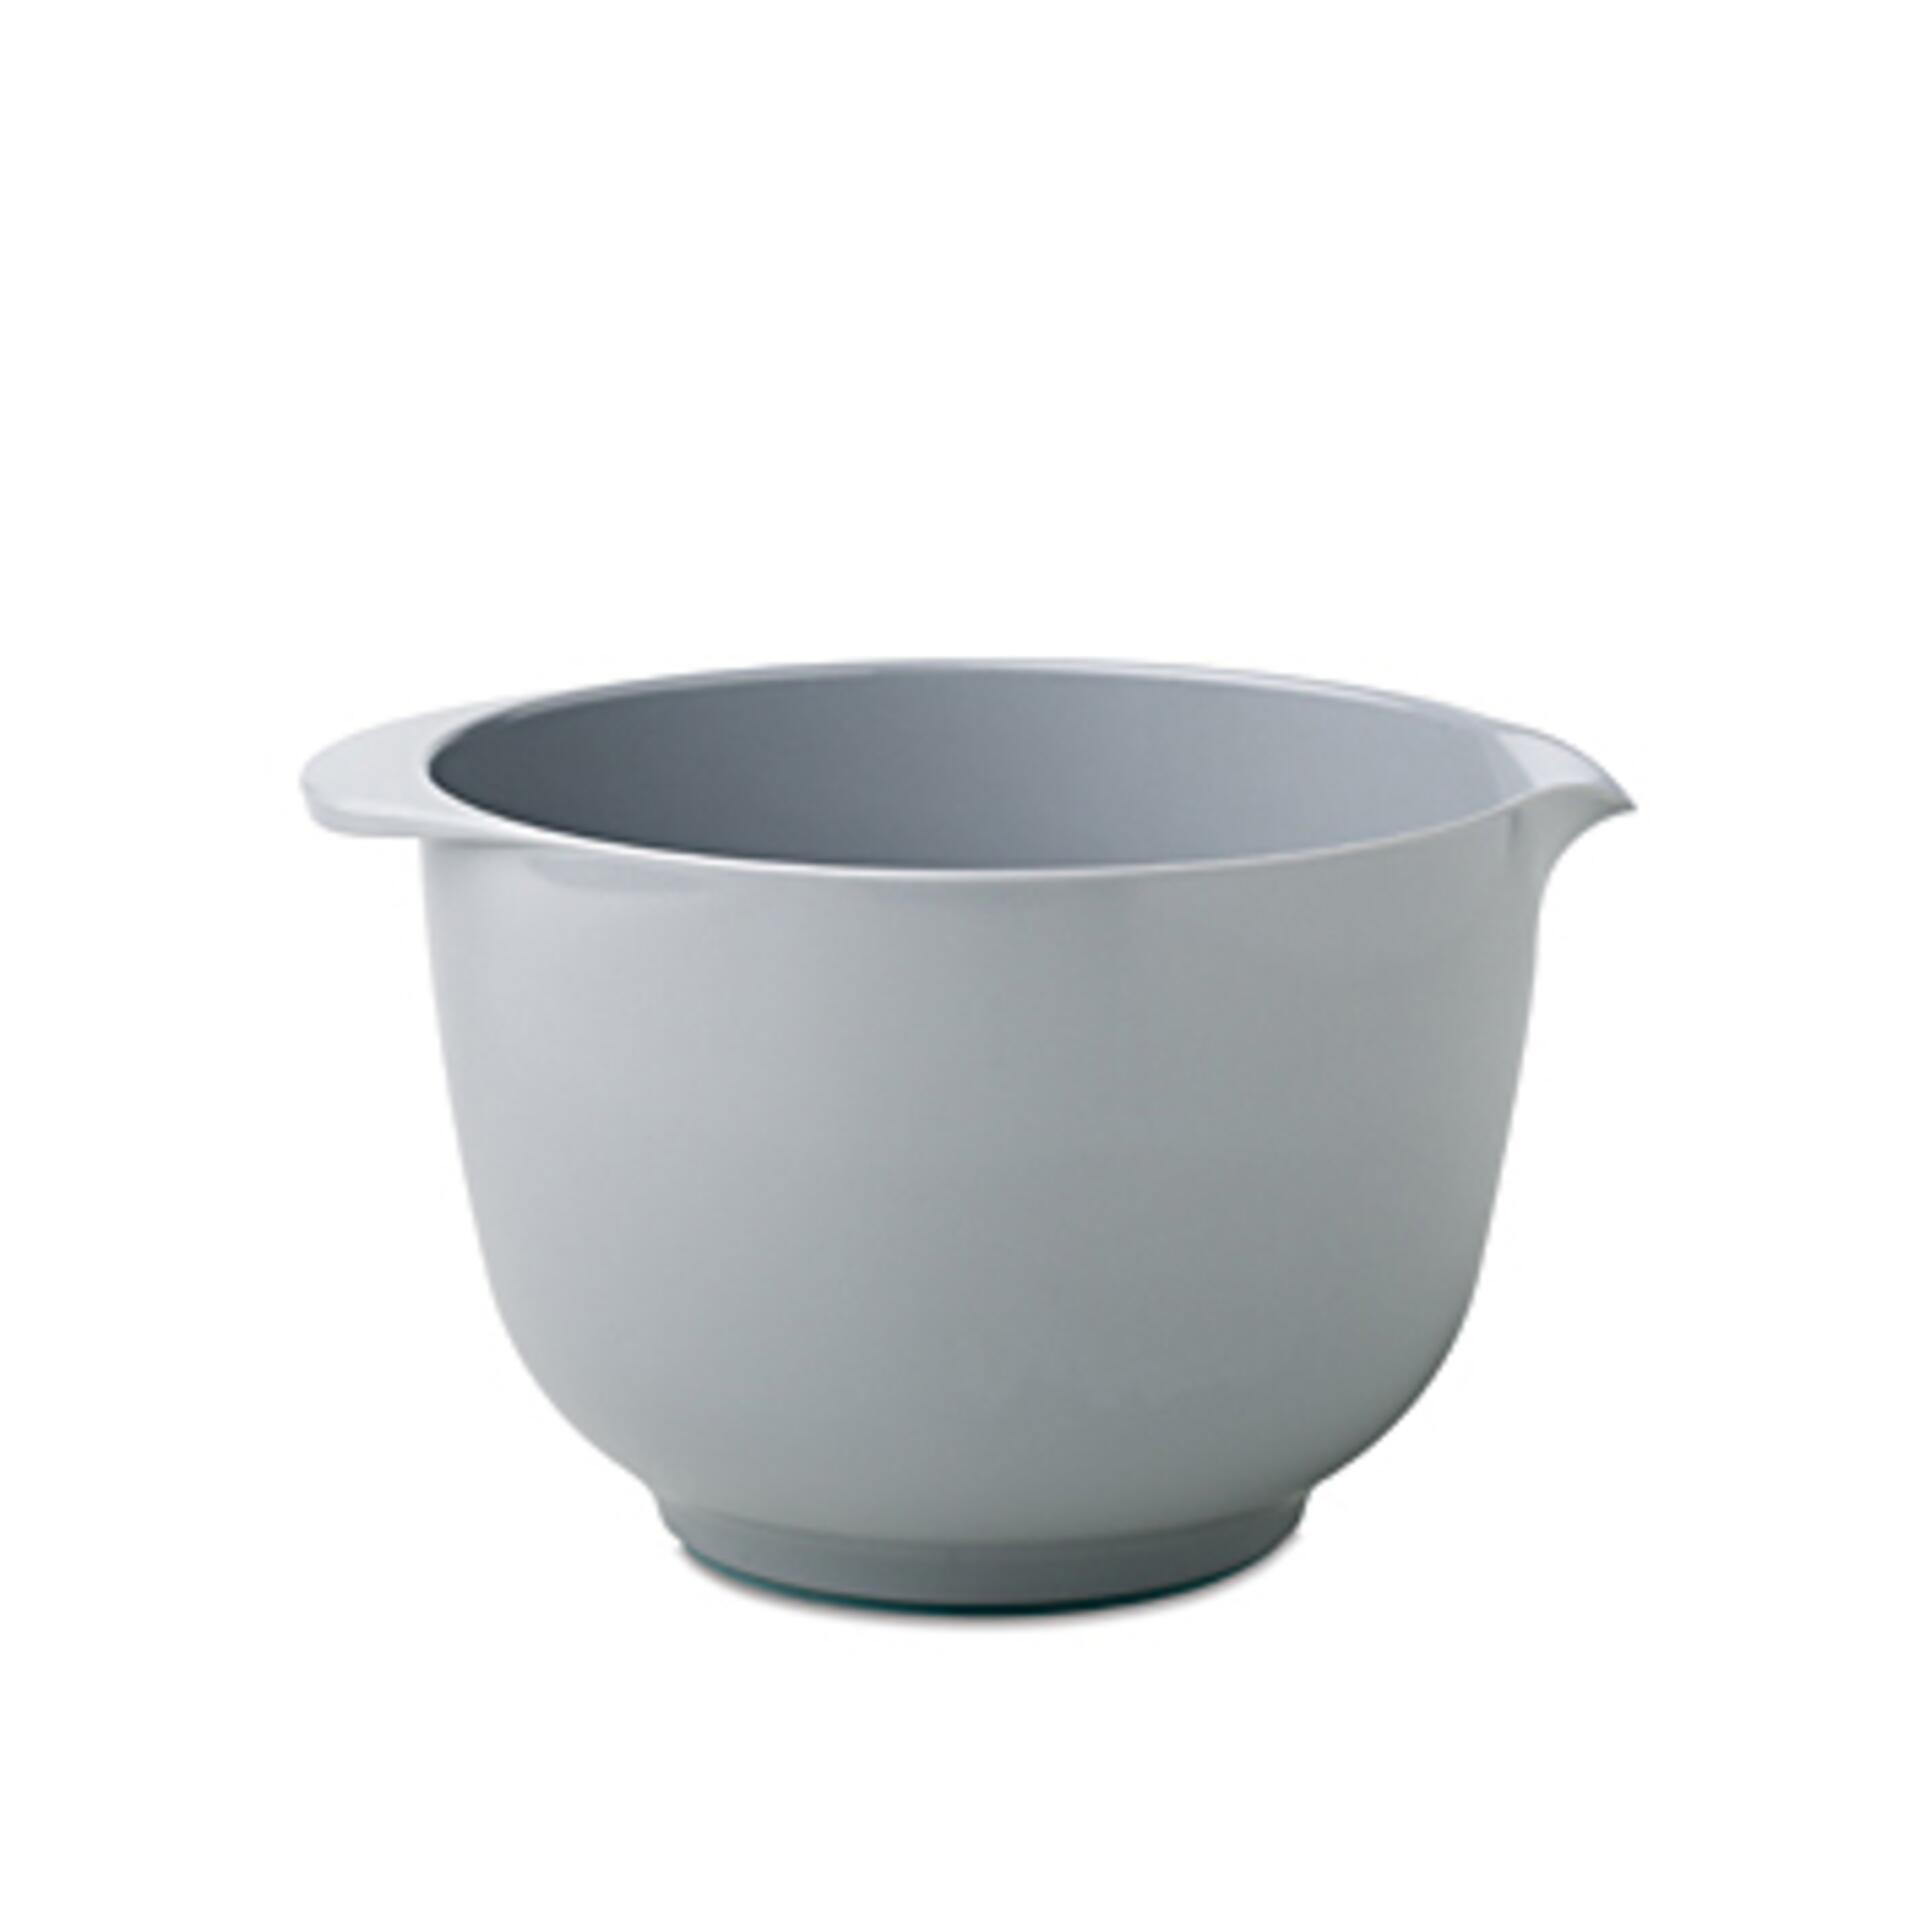 Rosti Mepal Margrethe Rührschüssel 2,0 l Grau